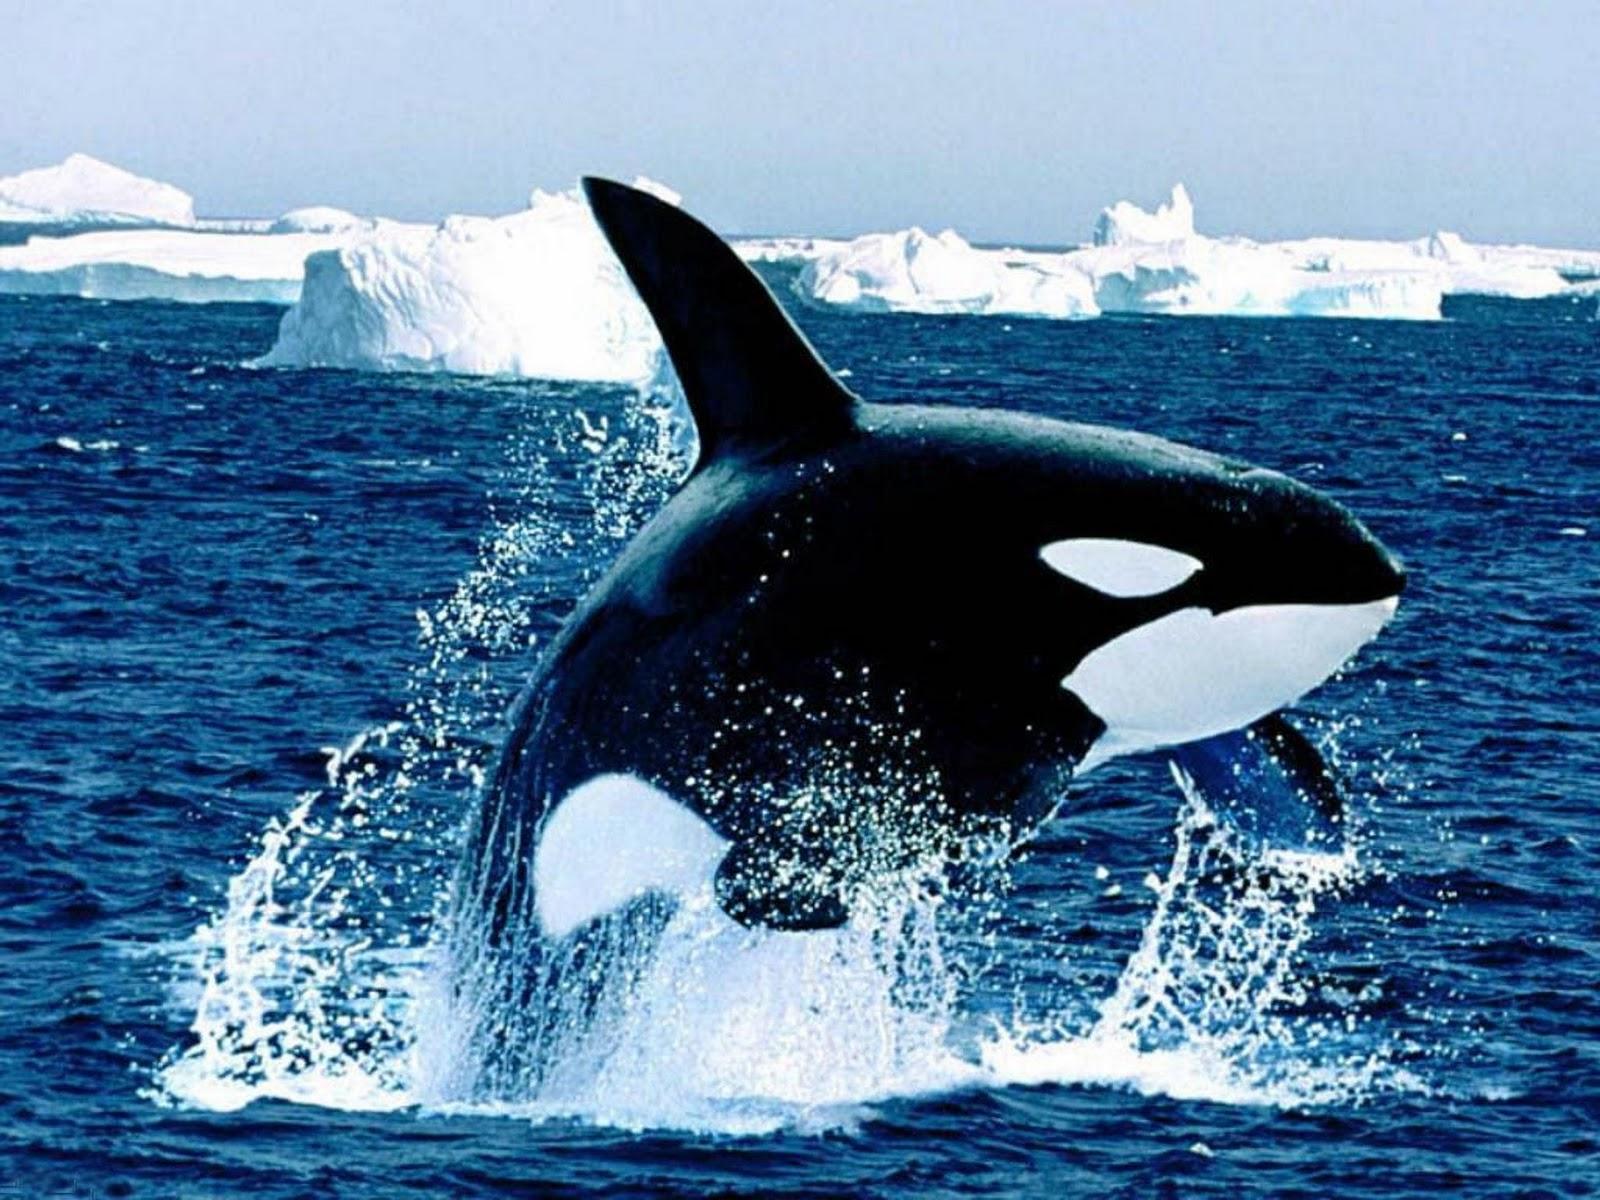 Love Killer Hd Wallpaper : fish wallpaper orca - HD Desktop Wallpapers 4k HD